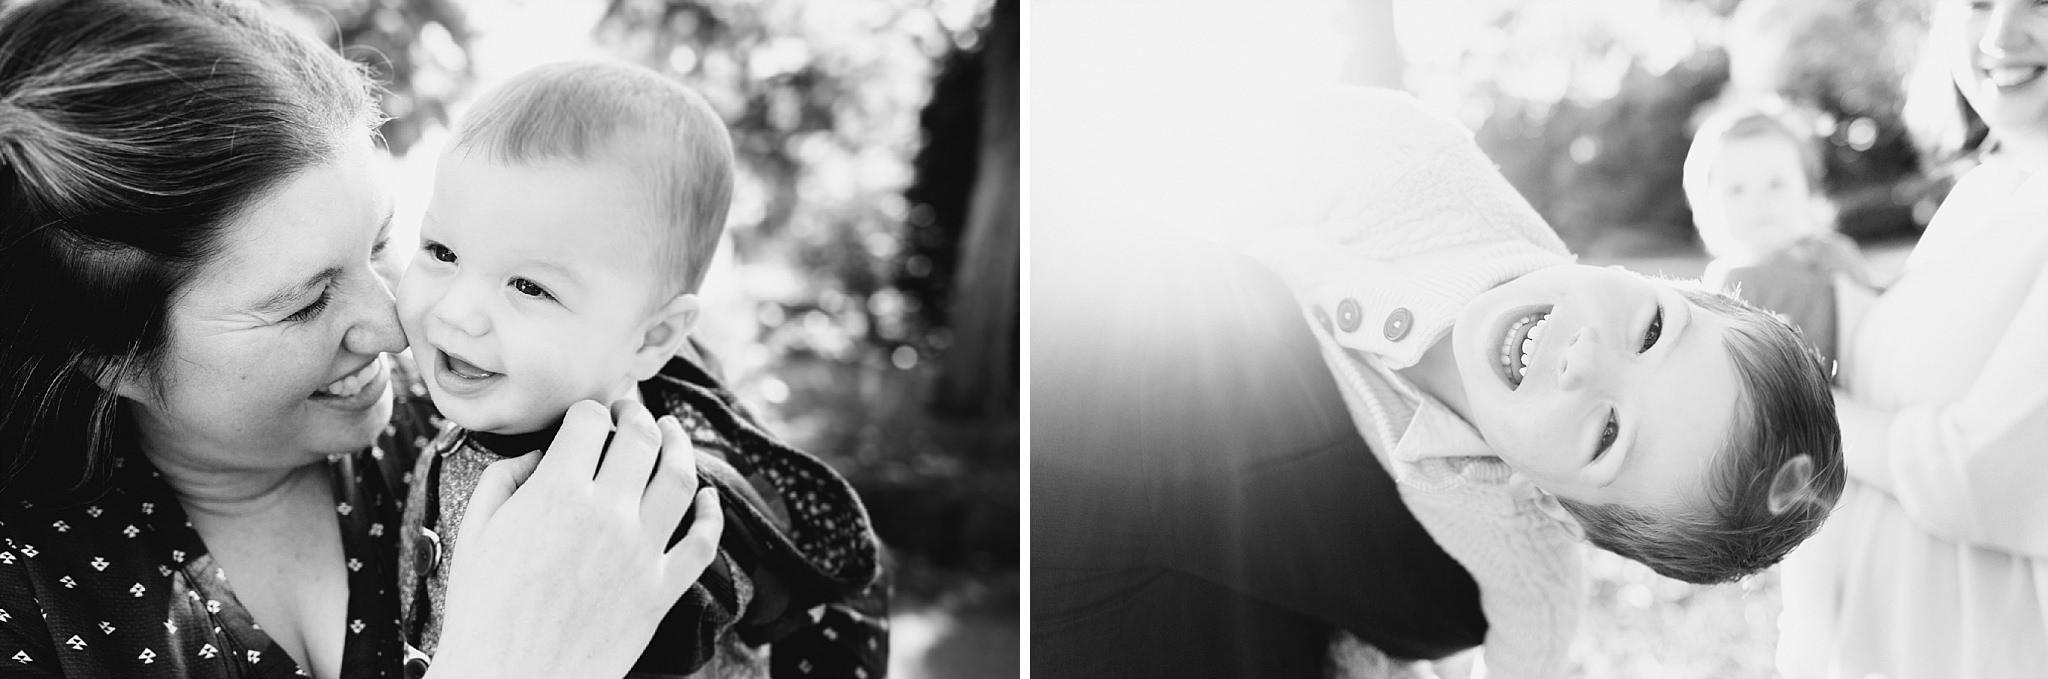 Lecinda Ward, Melbourne Family Newborn and Wedding Photographer_0068.jpg